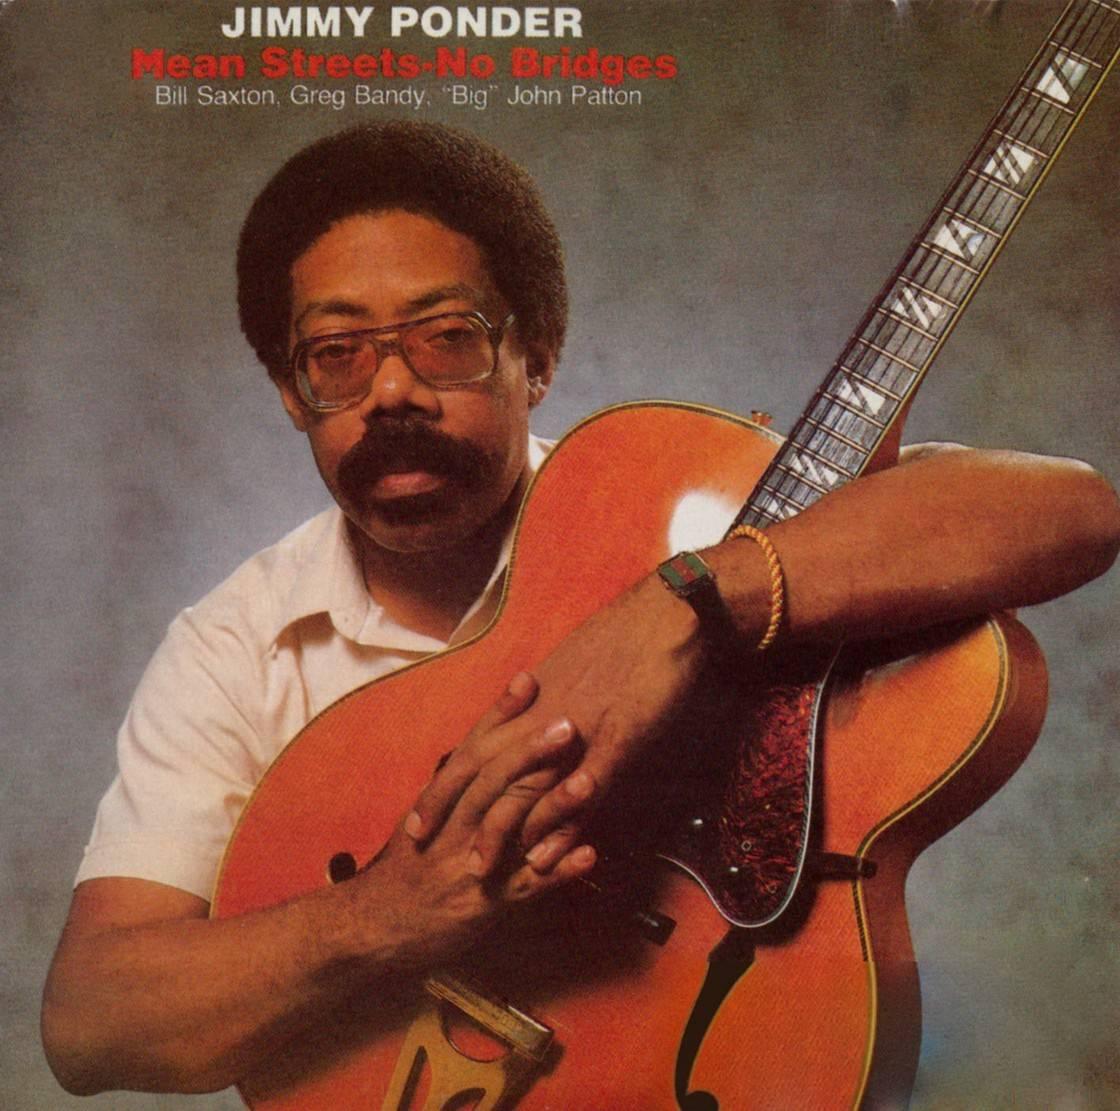 Jimmy Ponder - Mean Streets-No Bridges (1987) {Muse MCD5324}